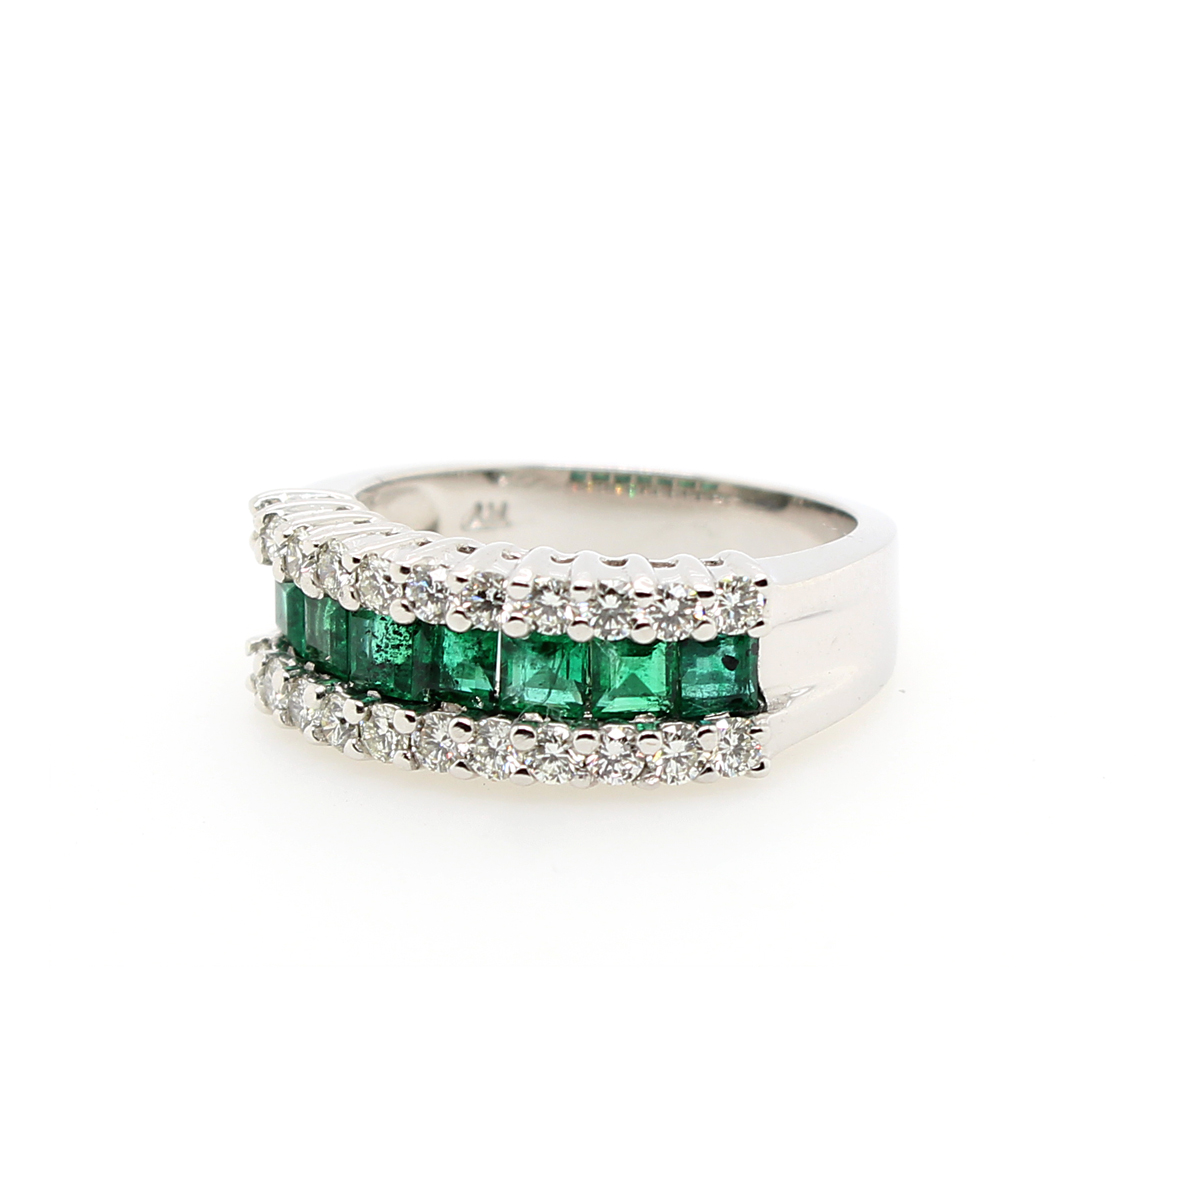 Ryan Gems 14 Karat White Gold Square Cut Emerald and Diamond Band